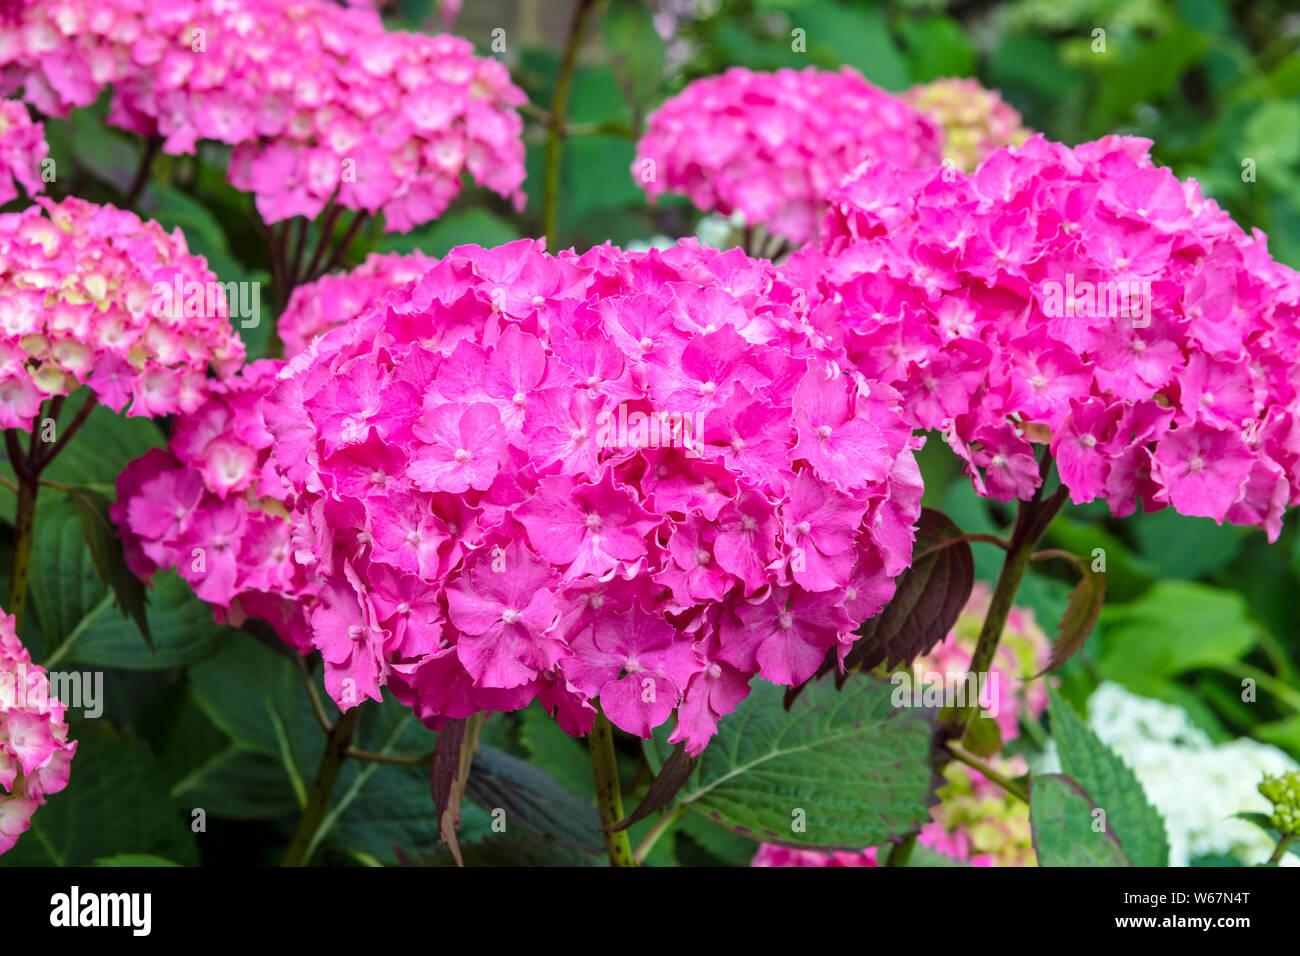 Mop Head Hydrangea Stock Photos Mop Head Hydrangea Stock Images